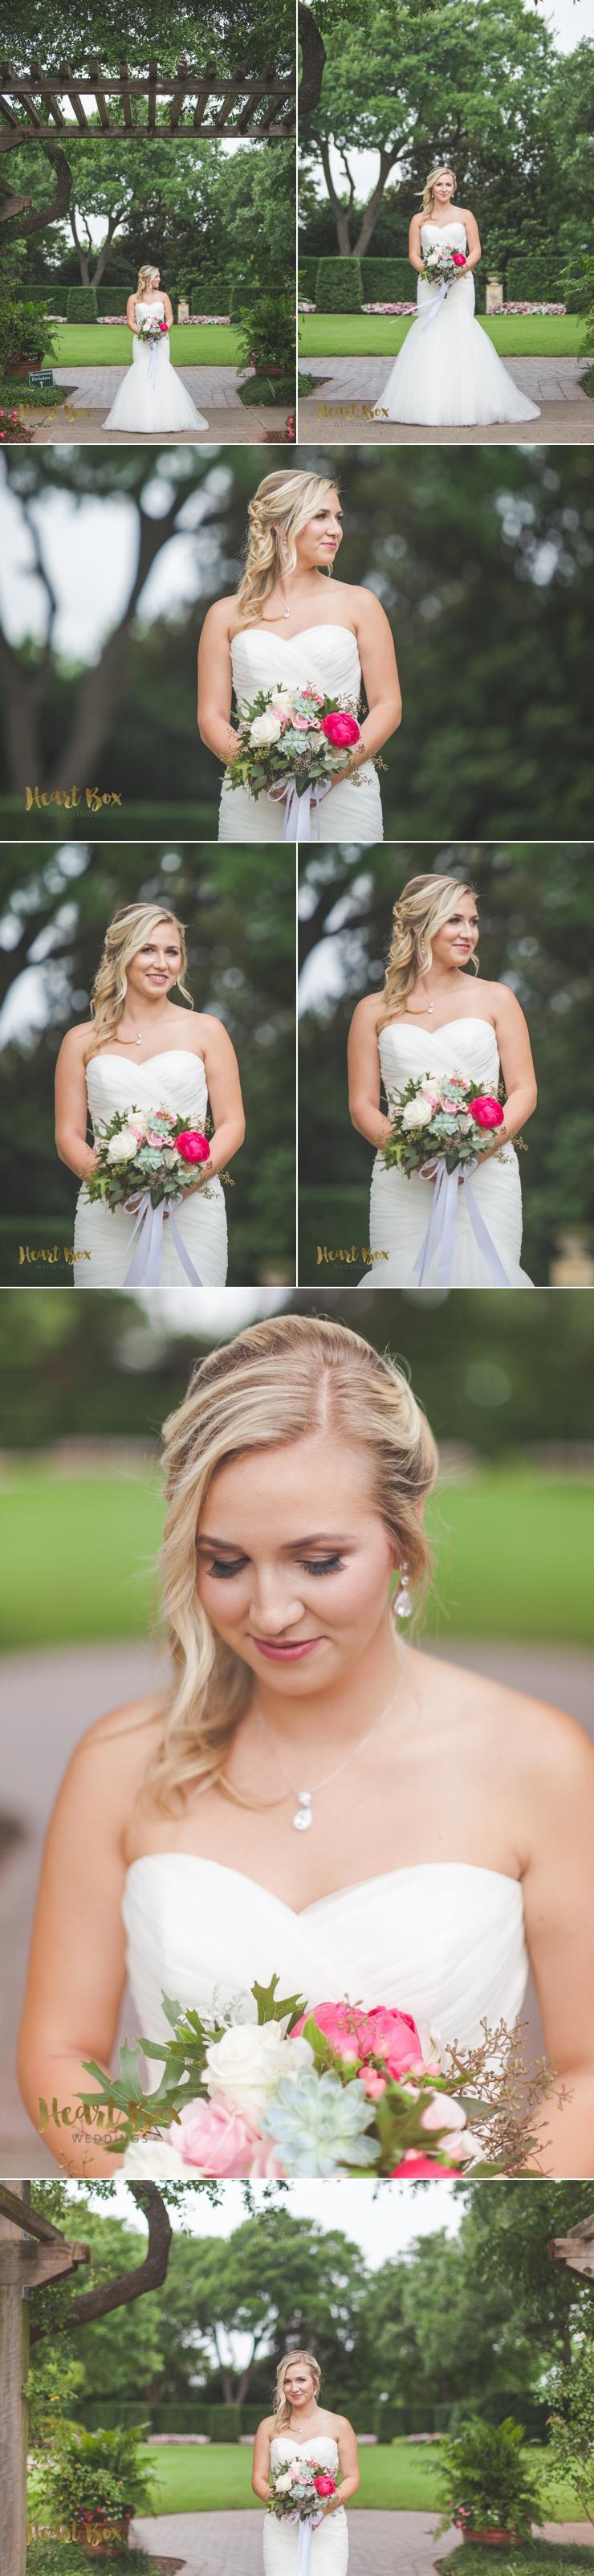 Karlee Bridal Blog Collages 3.jpg